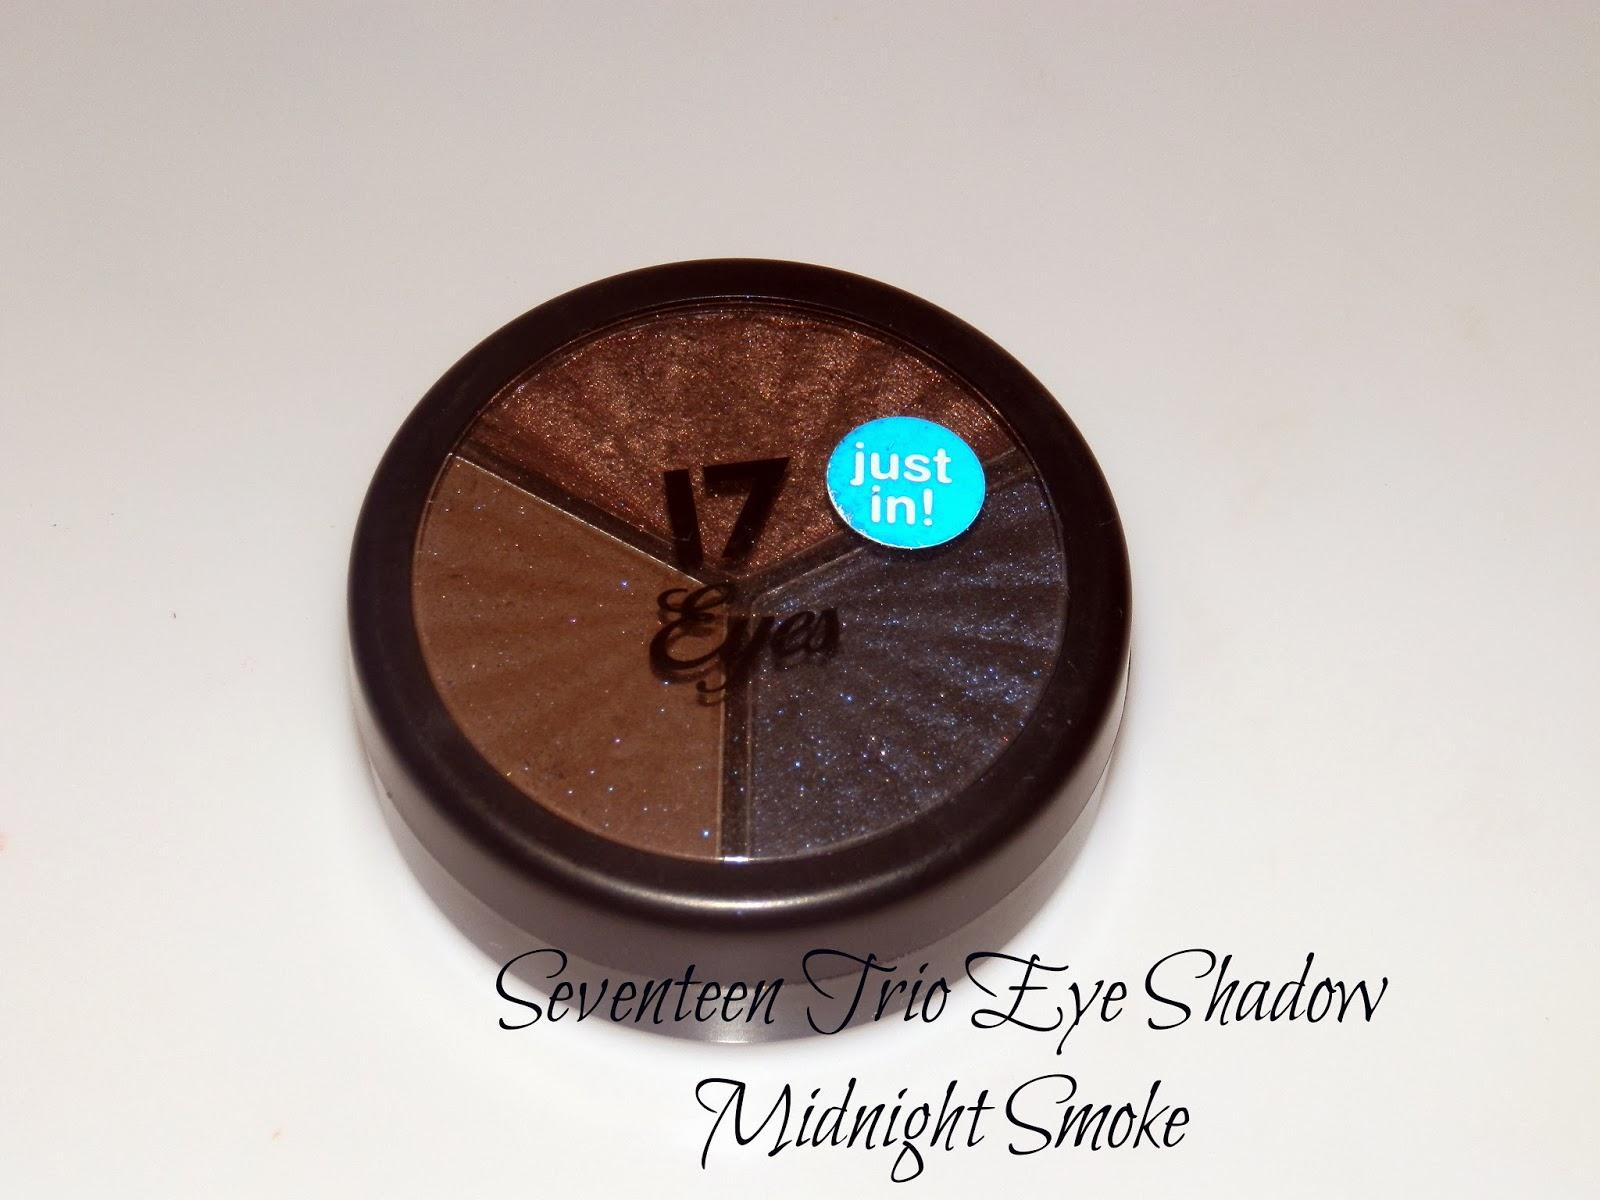 Seventeen Trio Eye Shadow Midnight Smoke Swatches